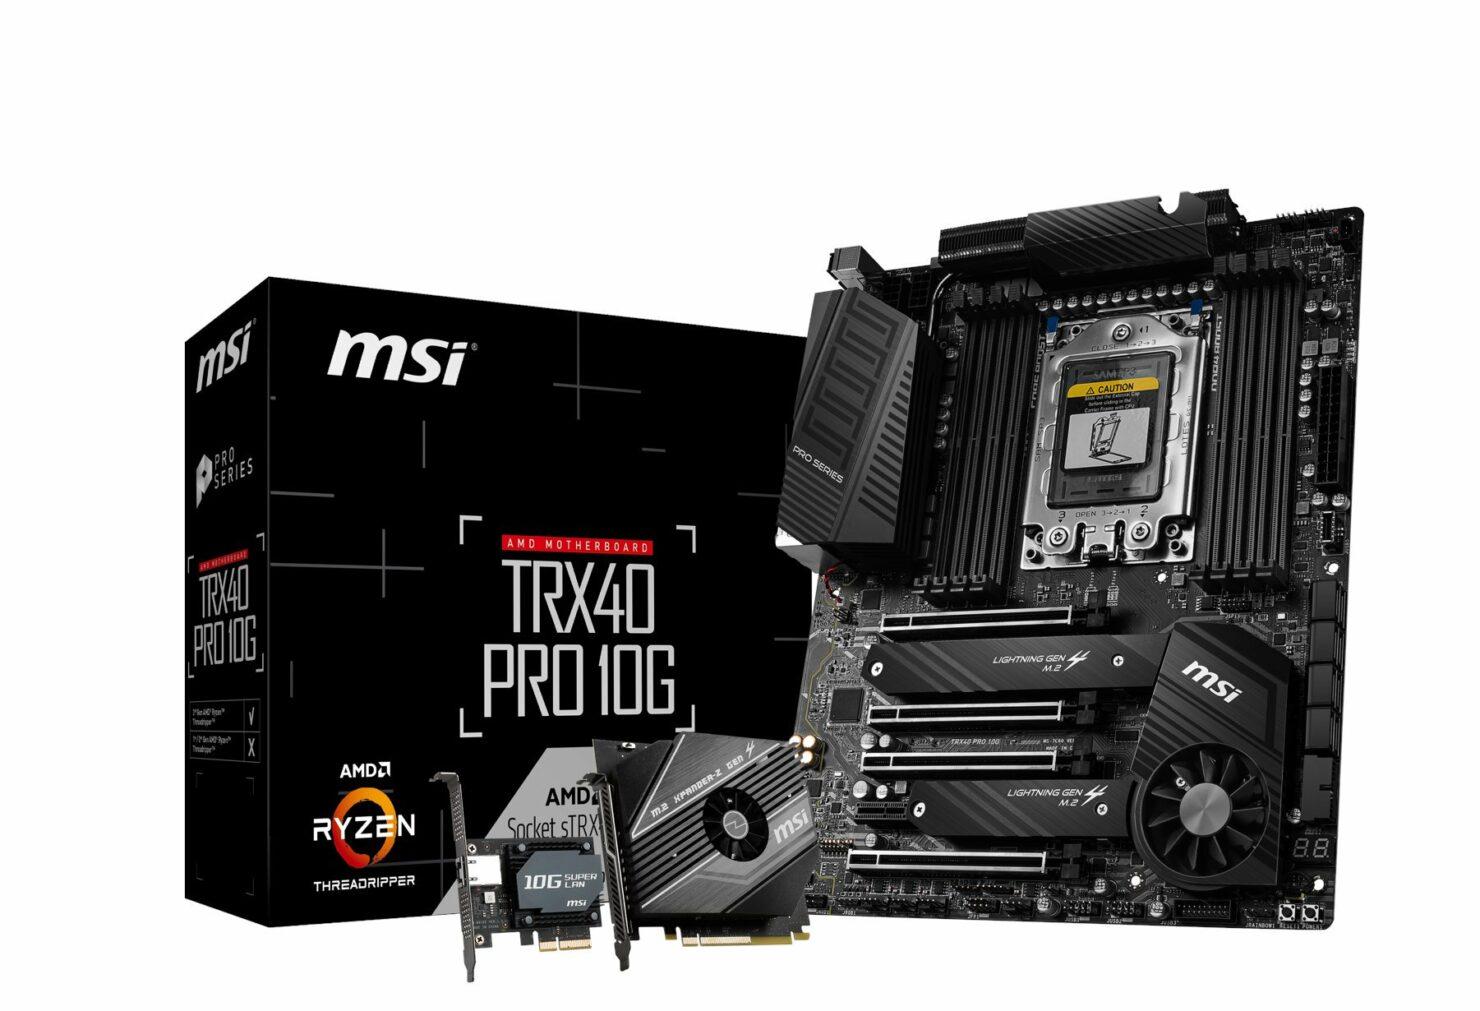 msi-trx40-pro-10g-motherboard